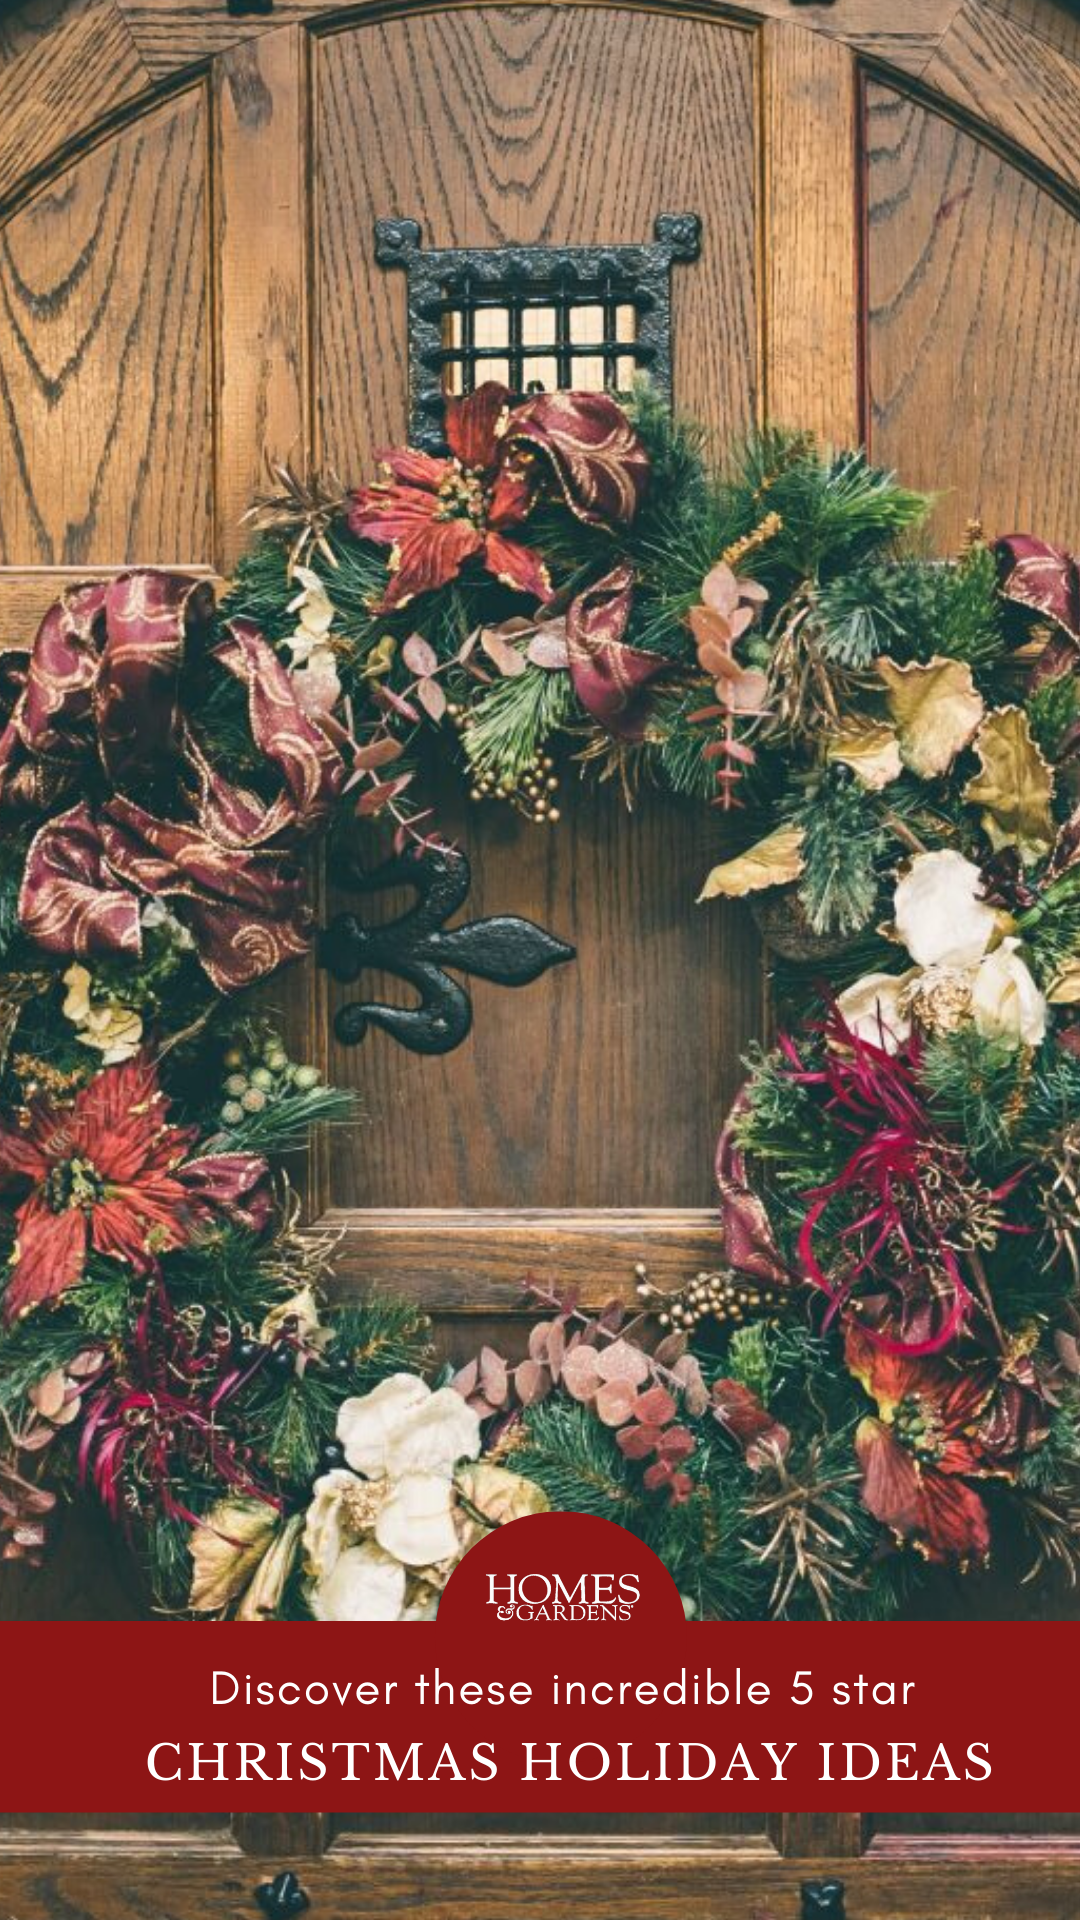 Fivestar Christmas holiday experiences across the UK